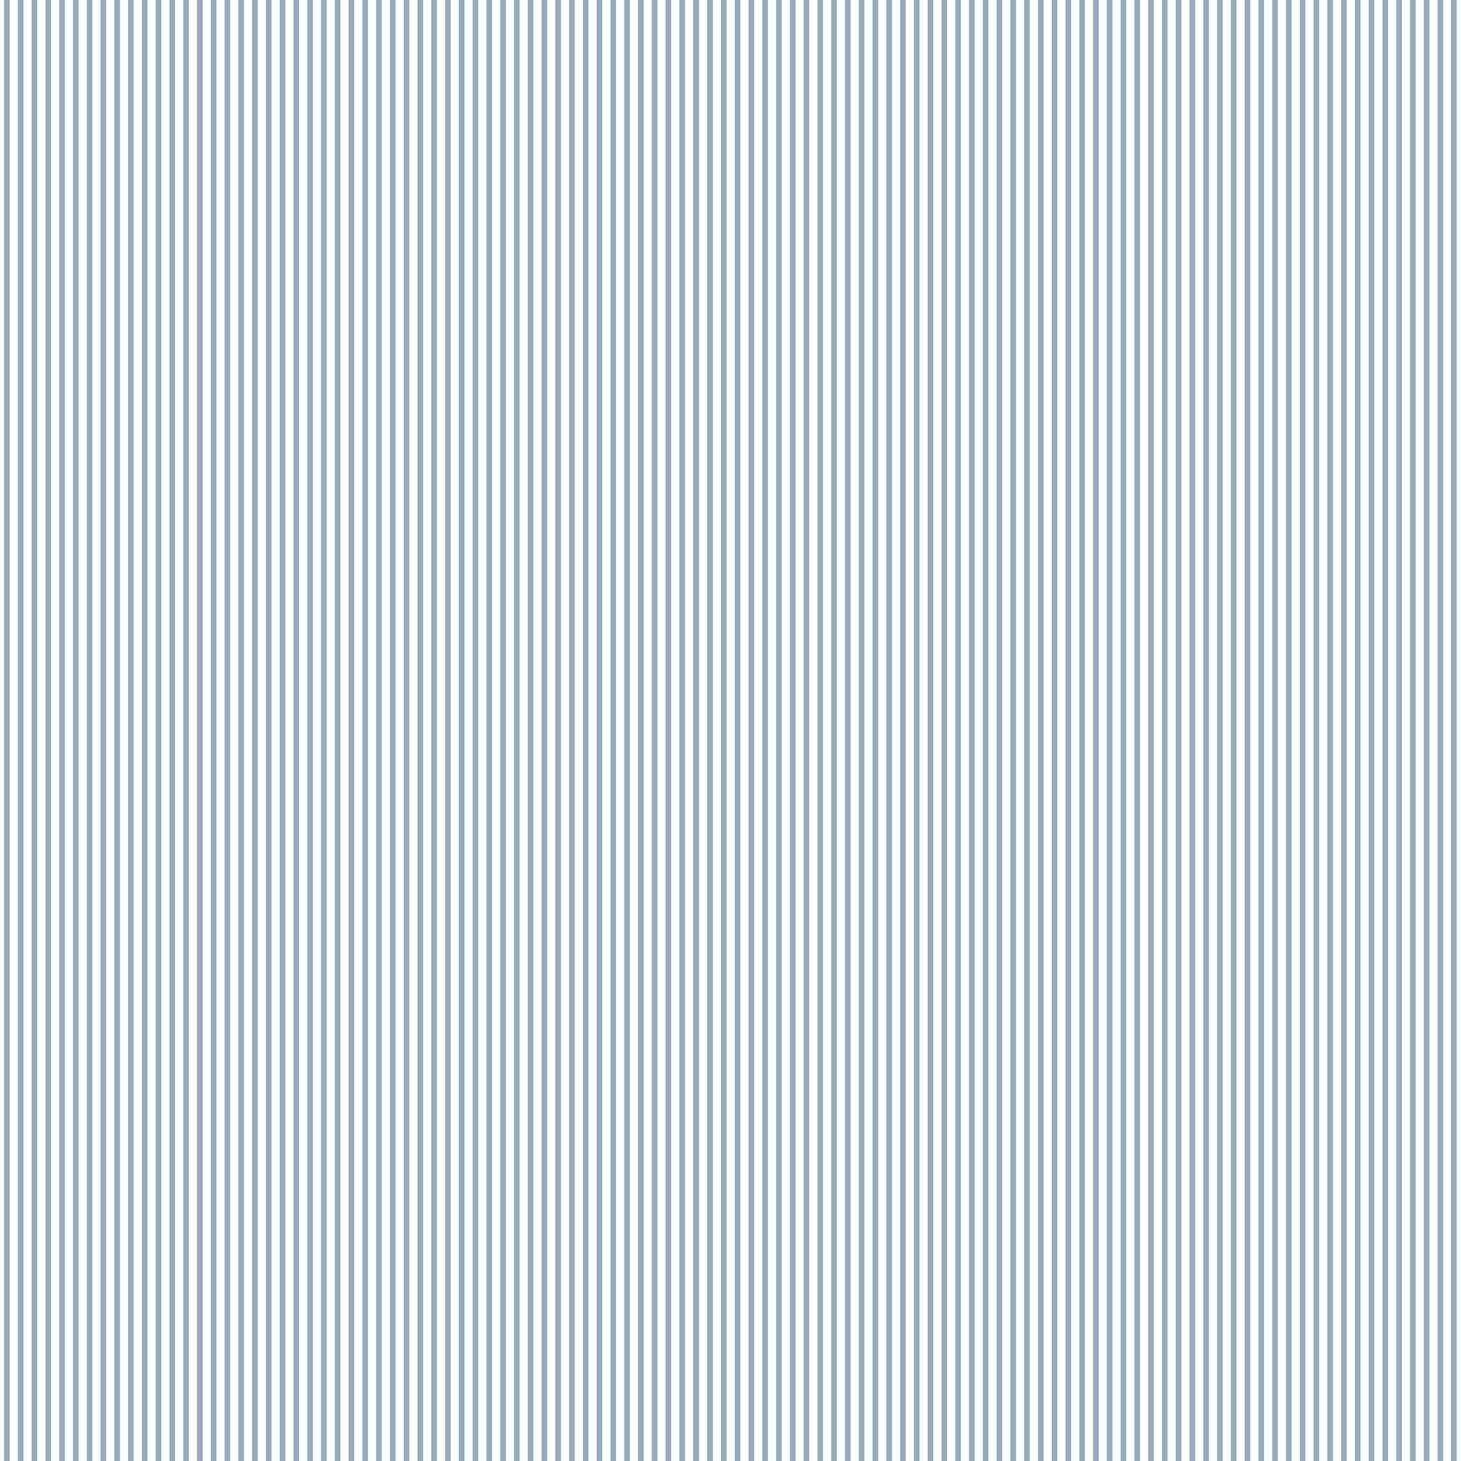 Essener Tapete Simply Stripes 3 St36913 blue Strisce Righe Tappezzeria in Vinile